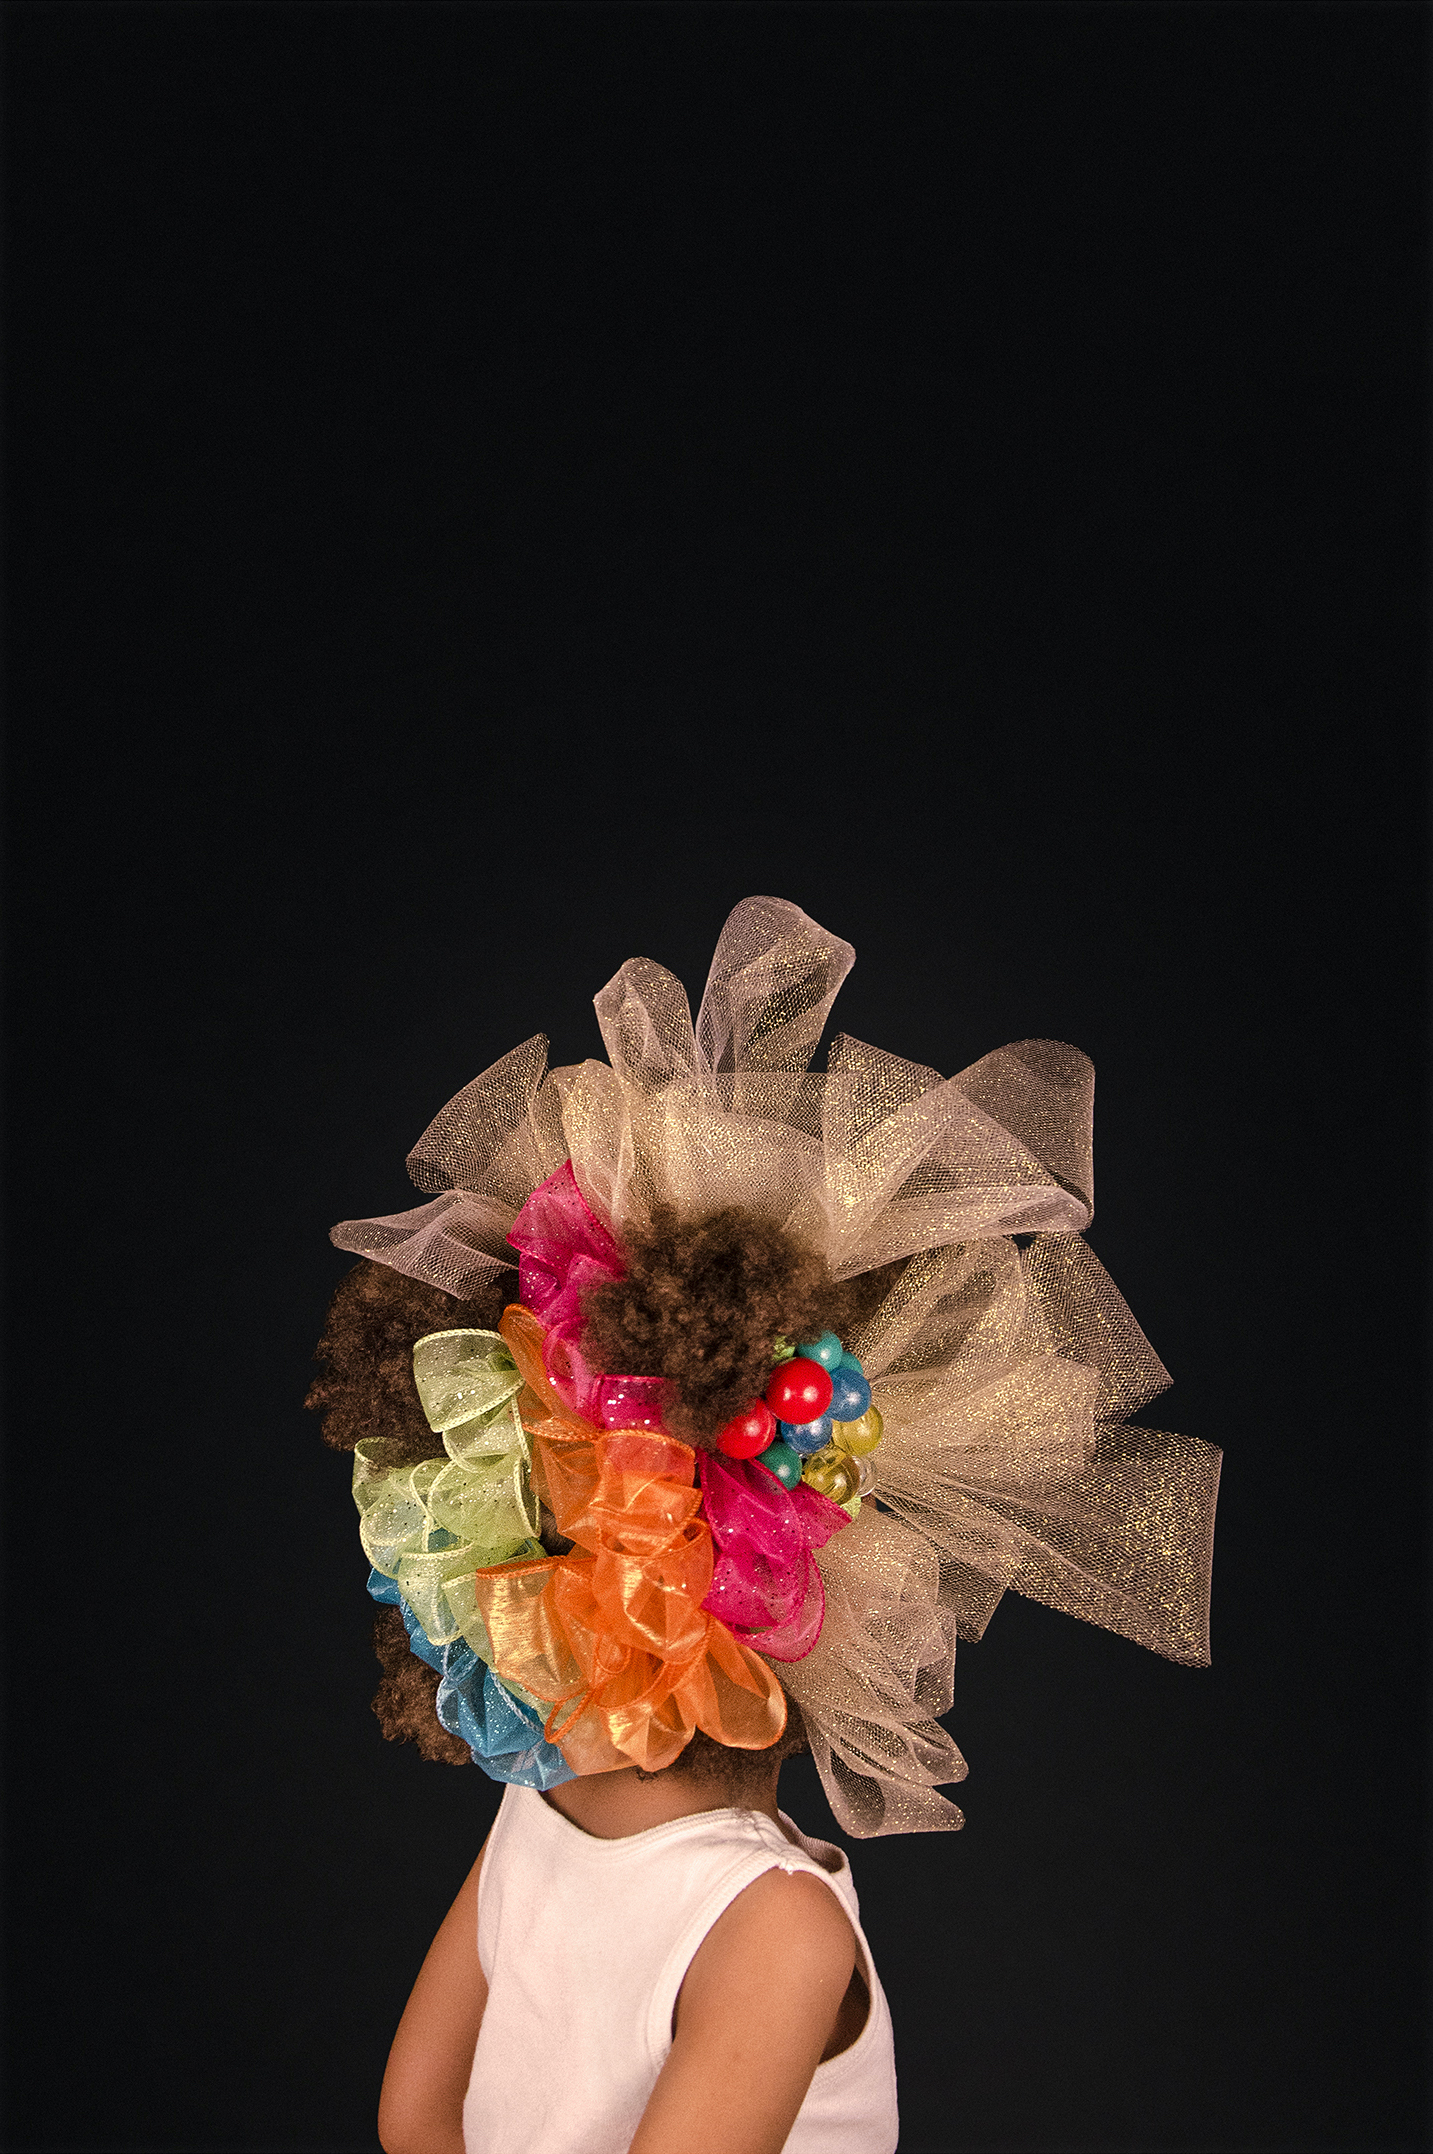 "Althea Murphy-Price, Goodie Girl III, 36"" x 26"", giclee print, 2018"